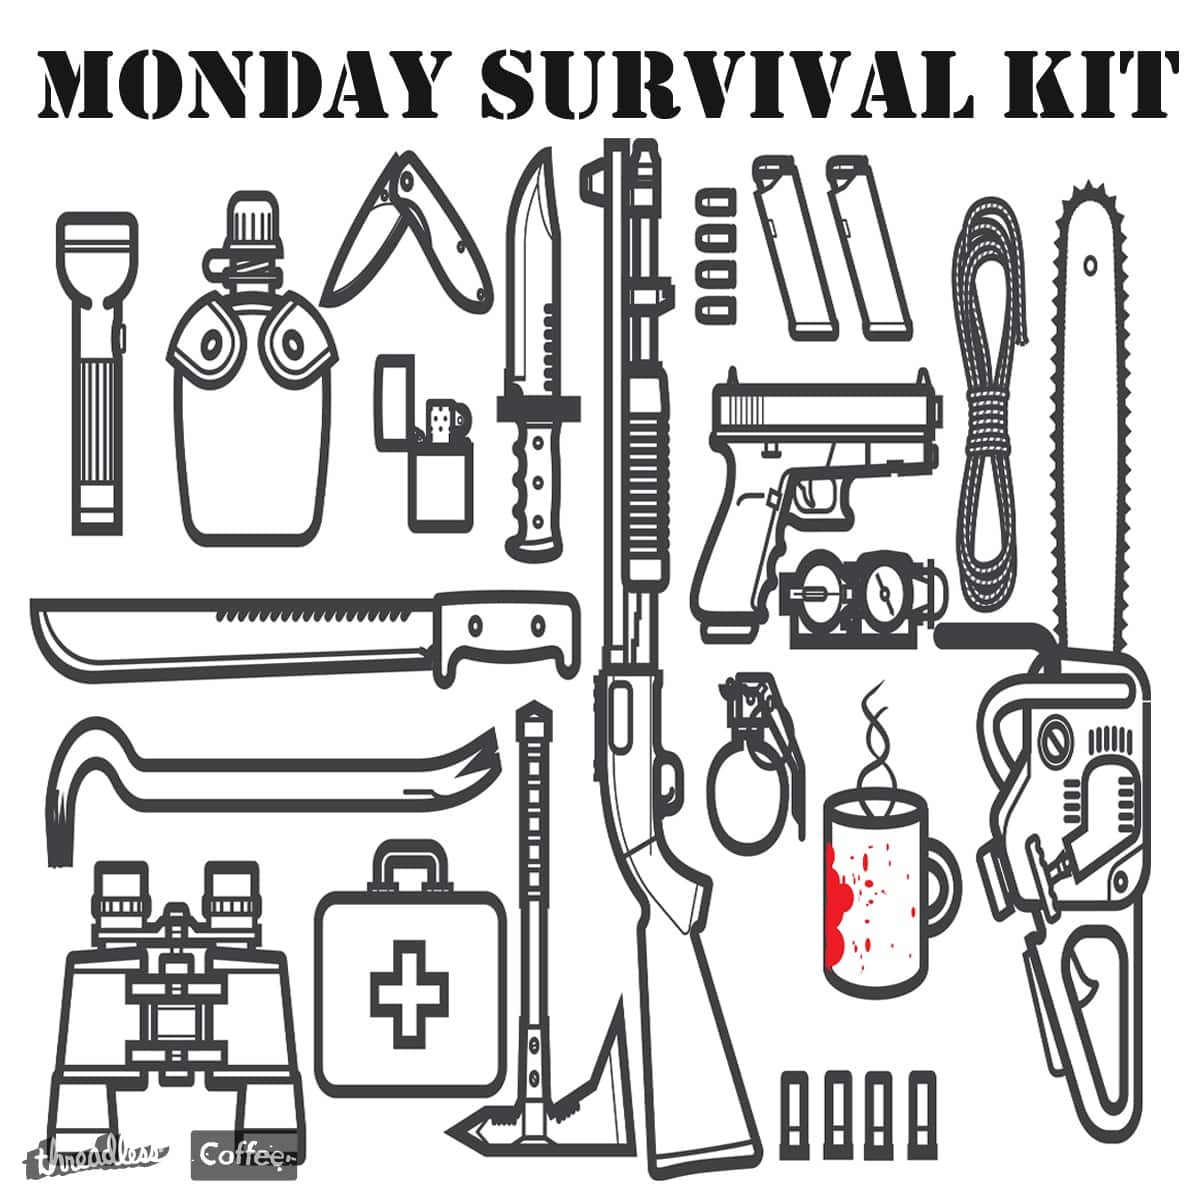 Score Monday Survival Kit by Giuliet Littlejohns on Threadless